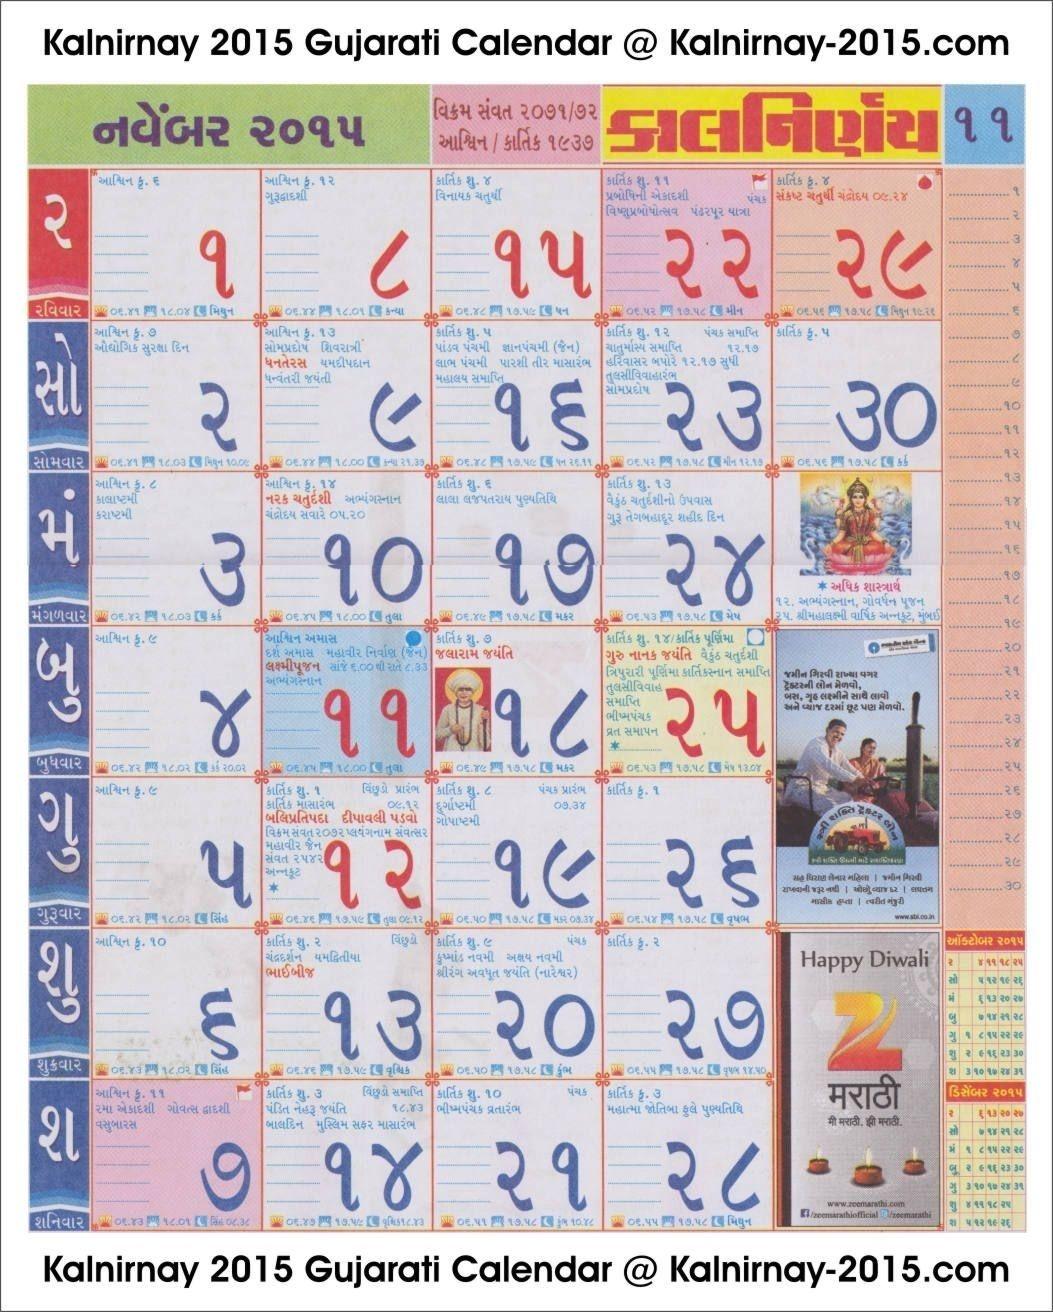 marathi calendar zodiac signs | ten free printable